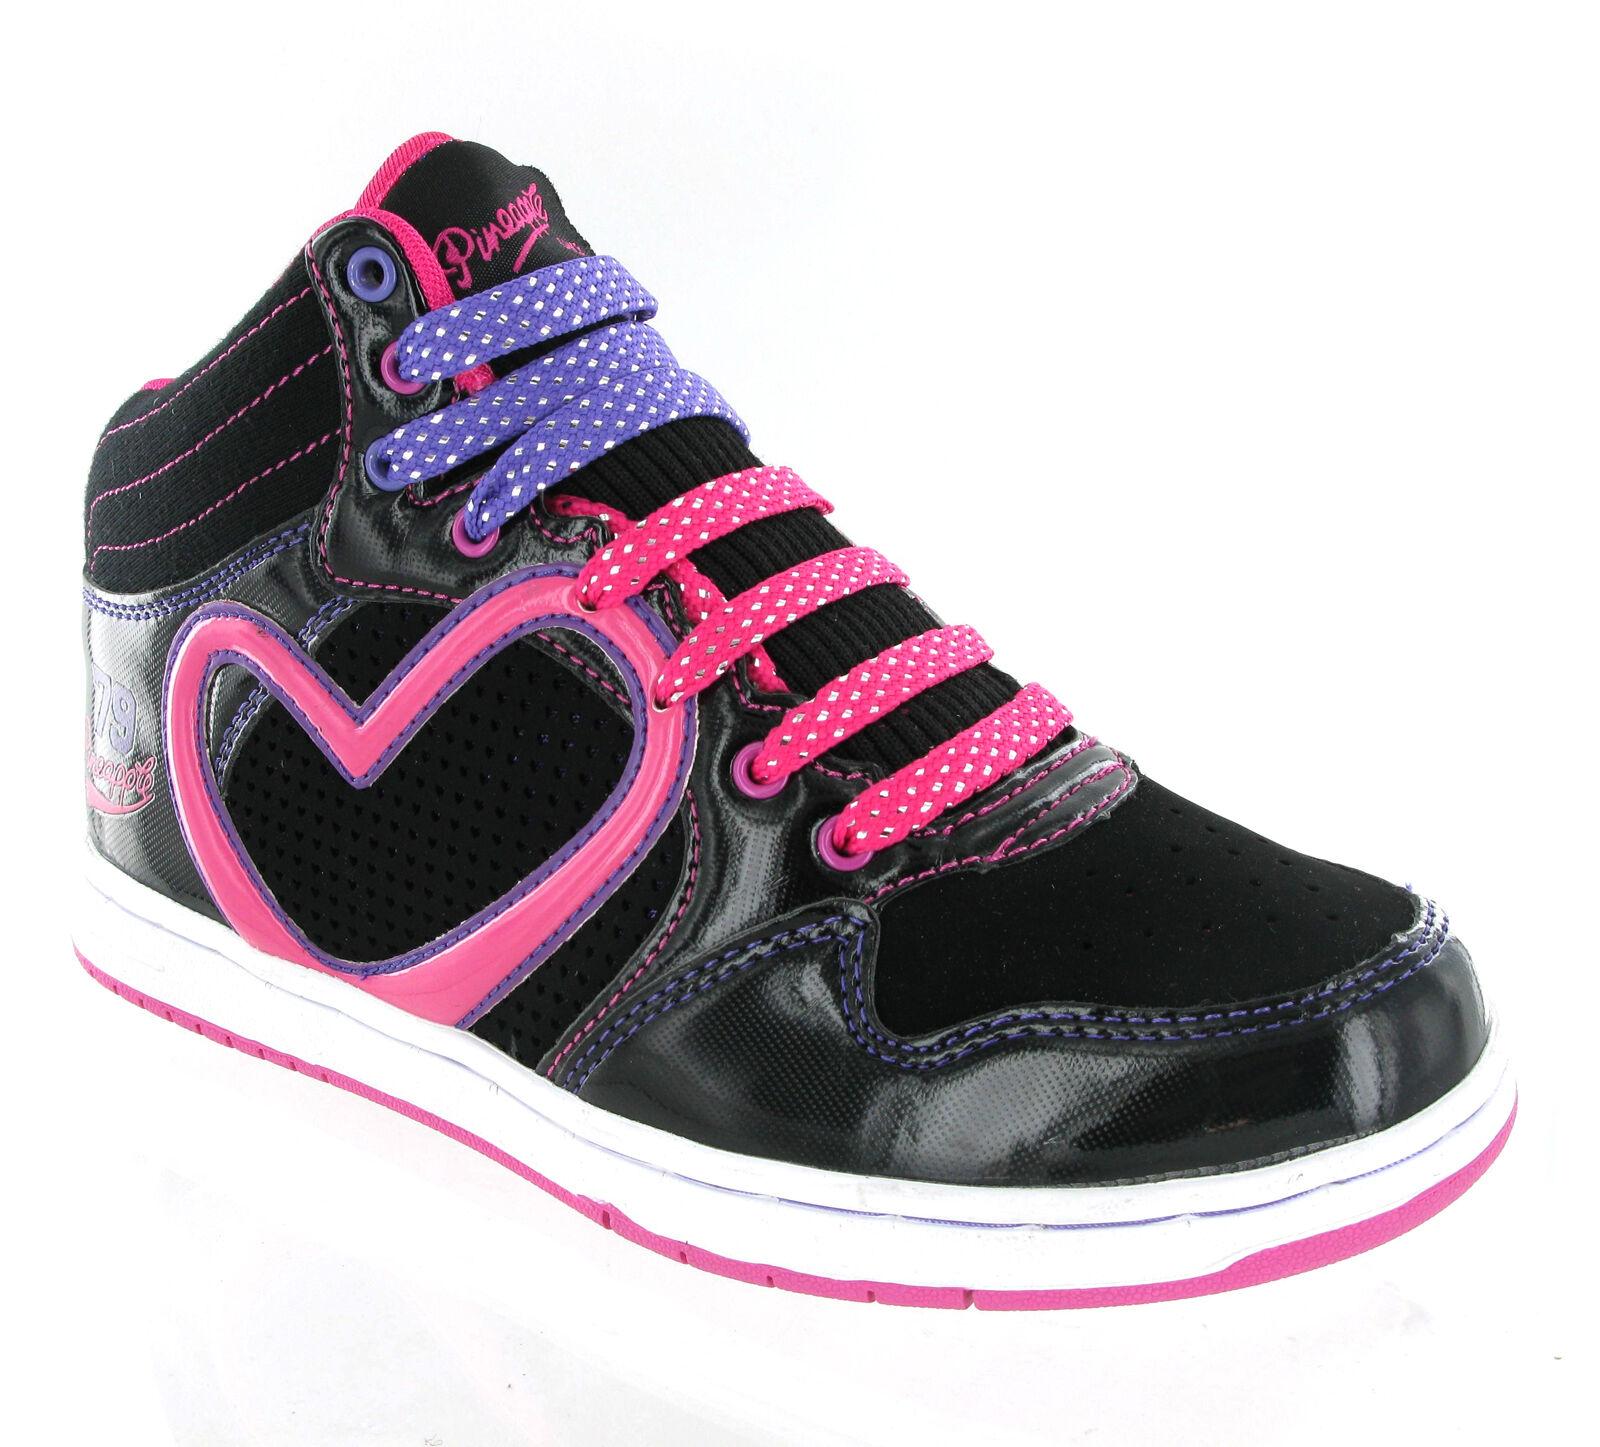 Femme Cheville Filles Hi High Tops Baskets Femmes Danse Baseball Bottes Cheville Chaussures